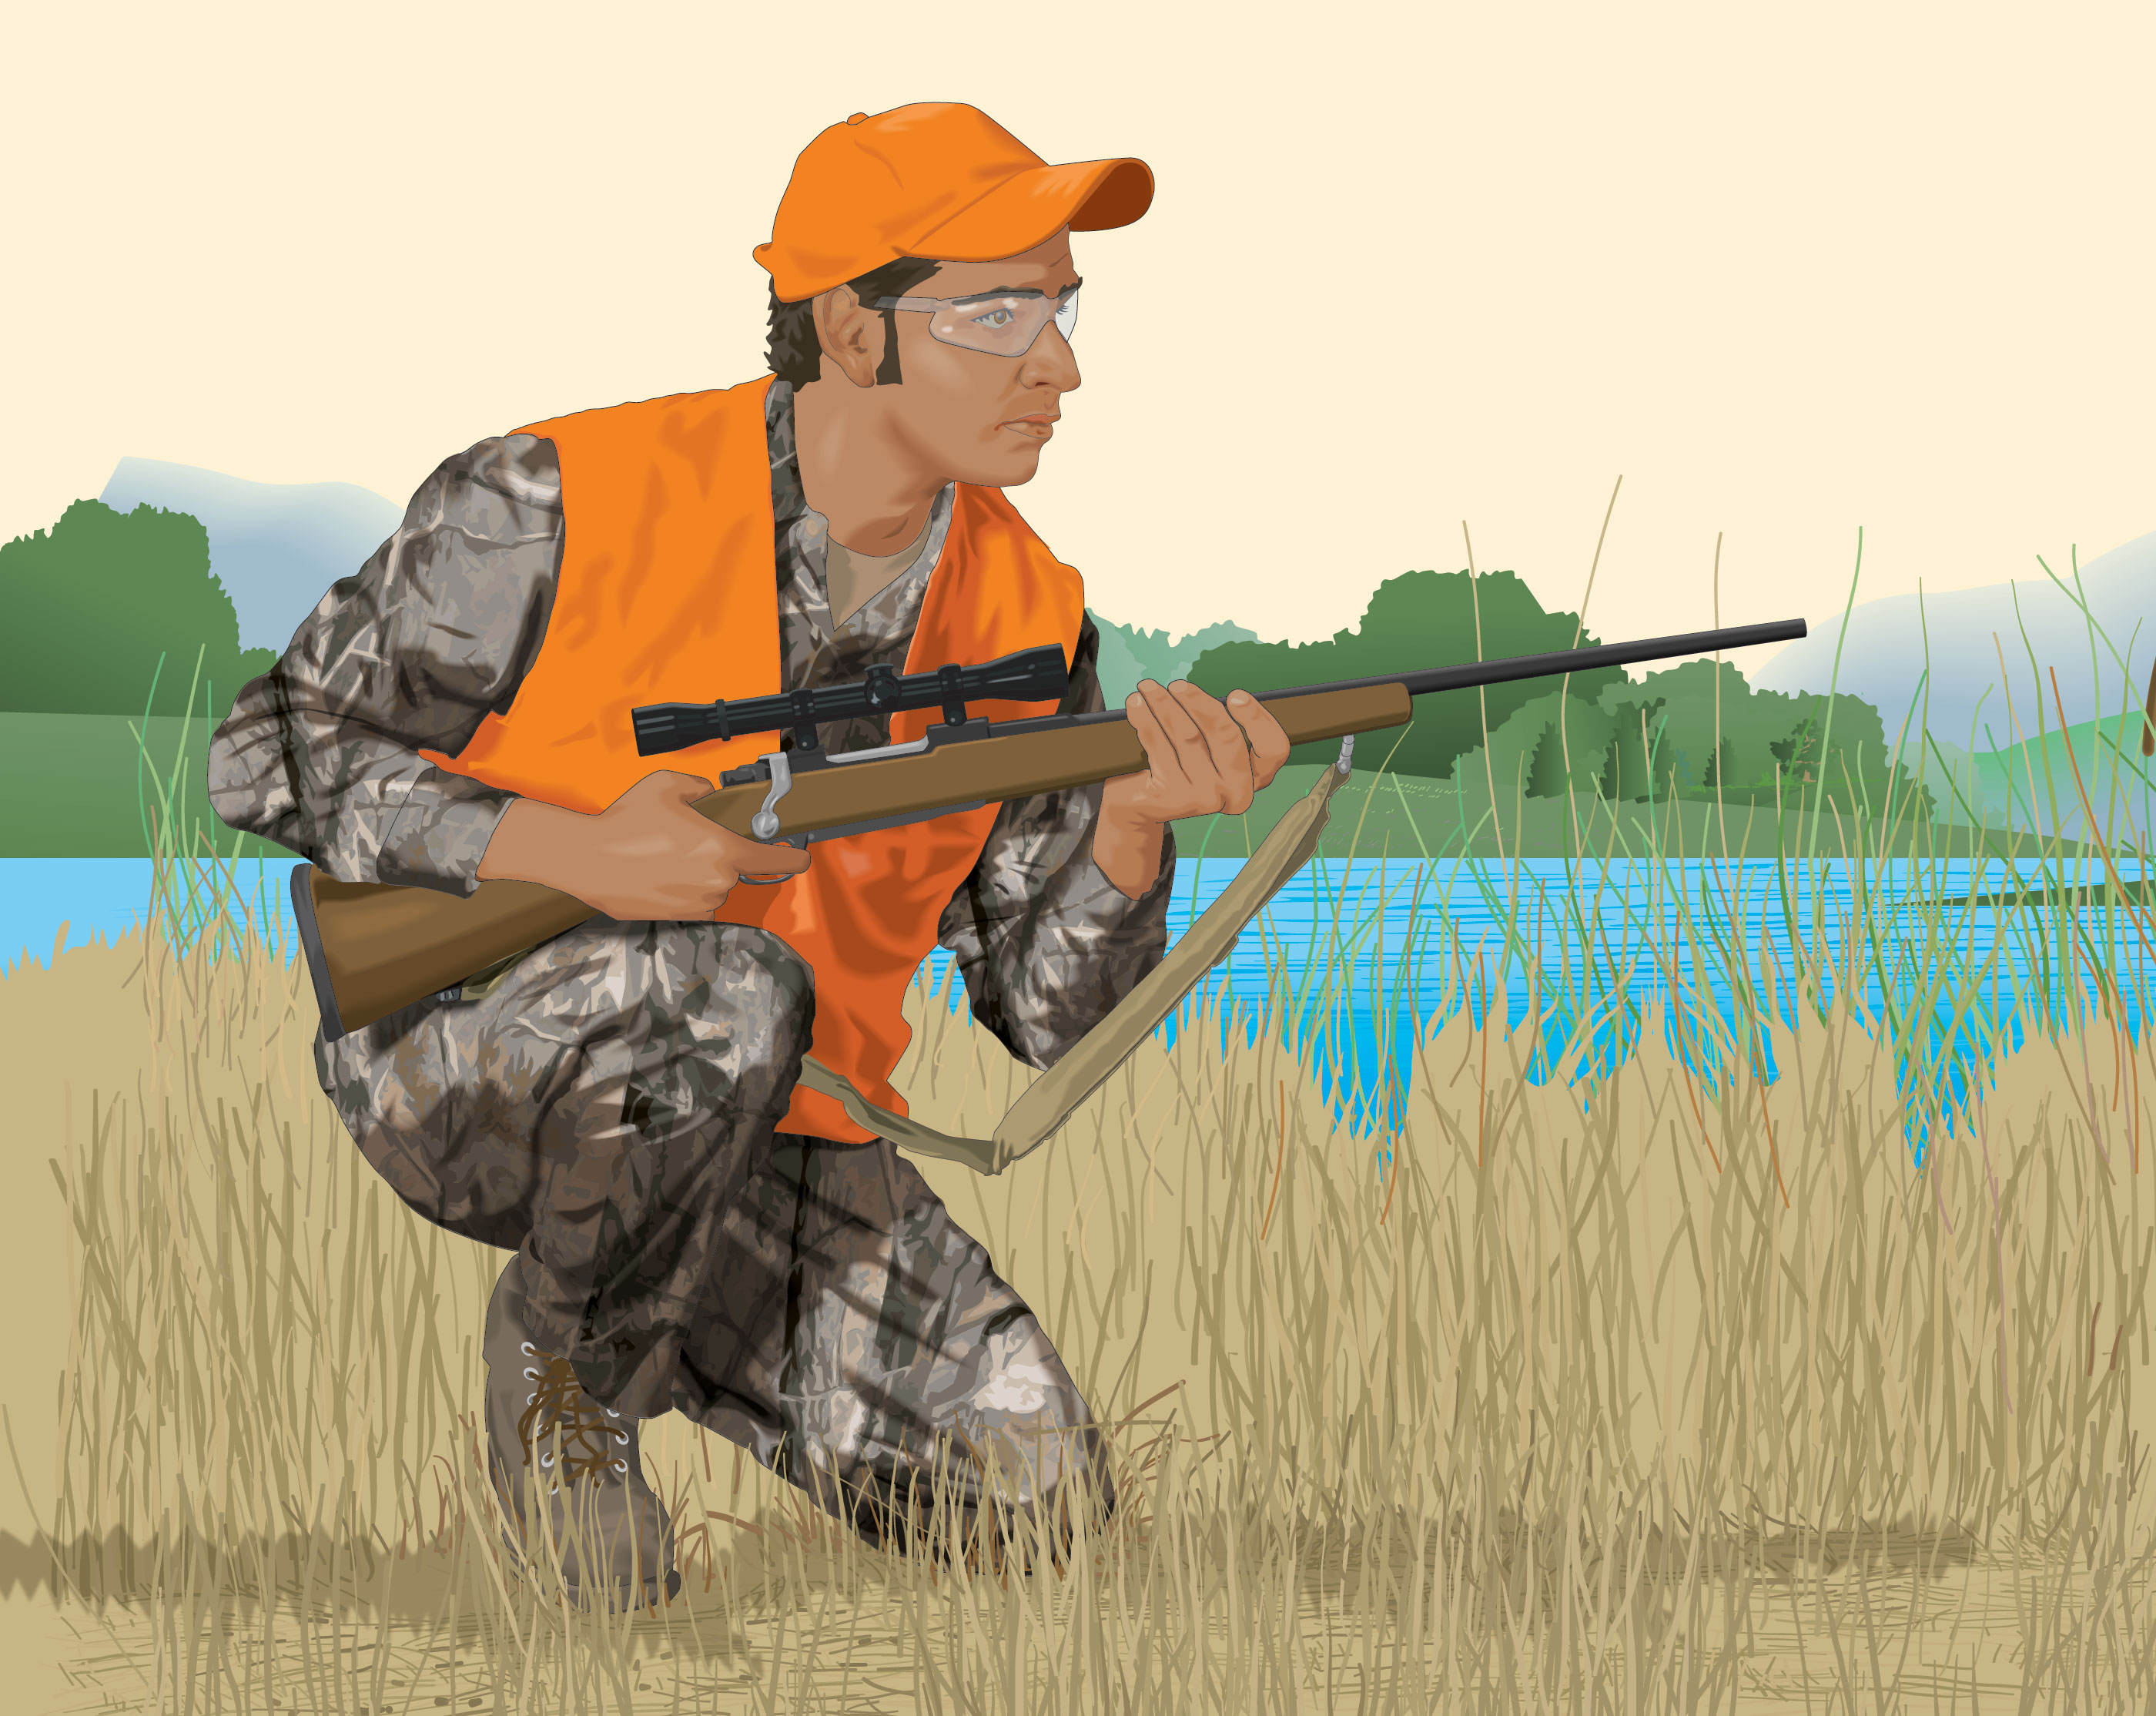 Still hunter crouching by edge of marsh